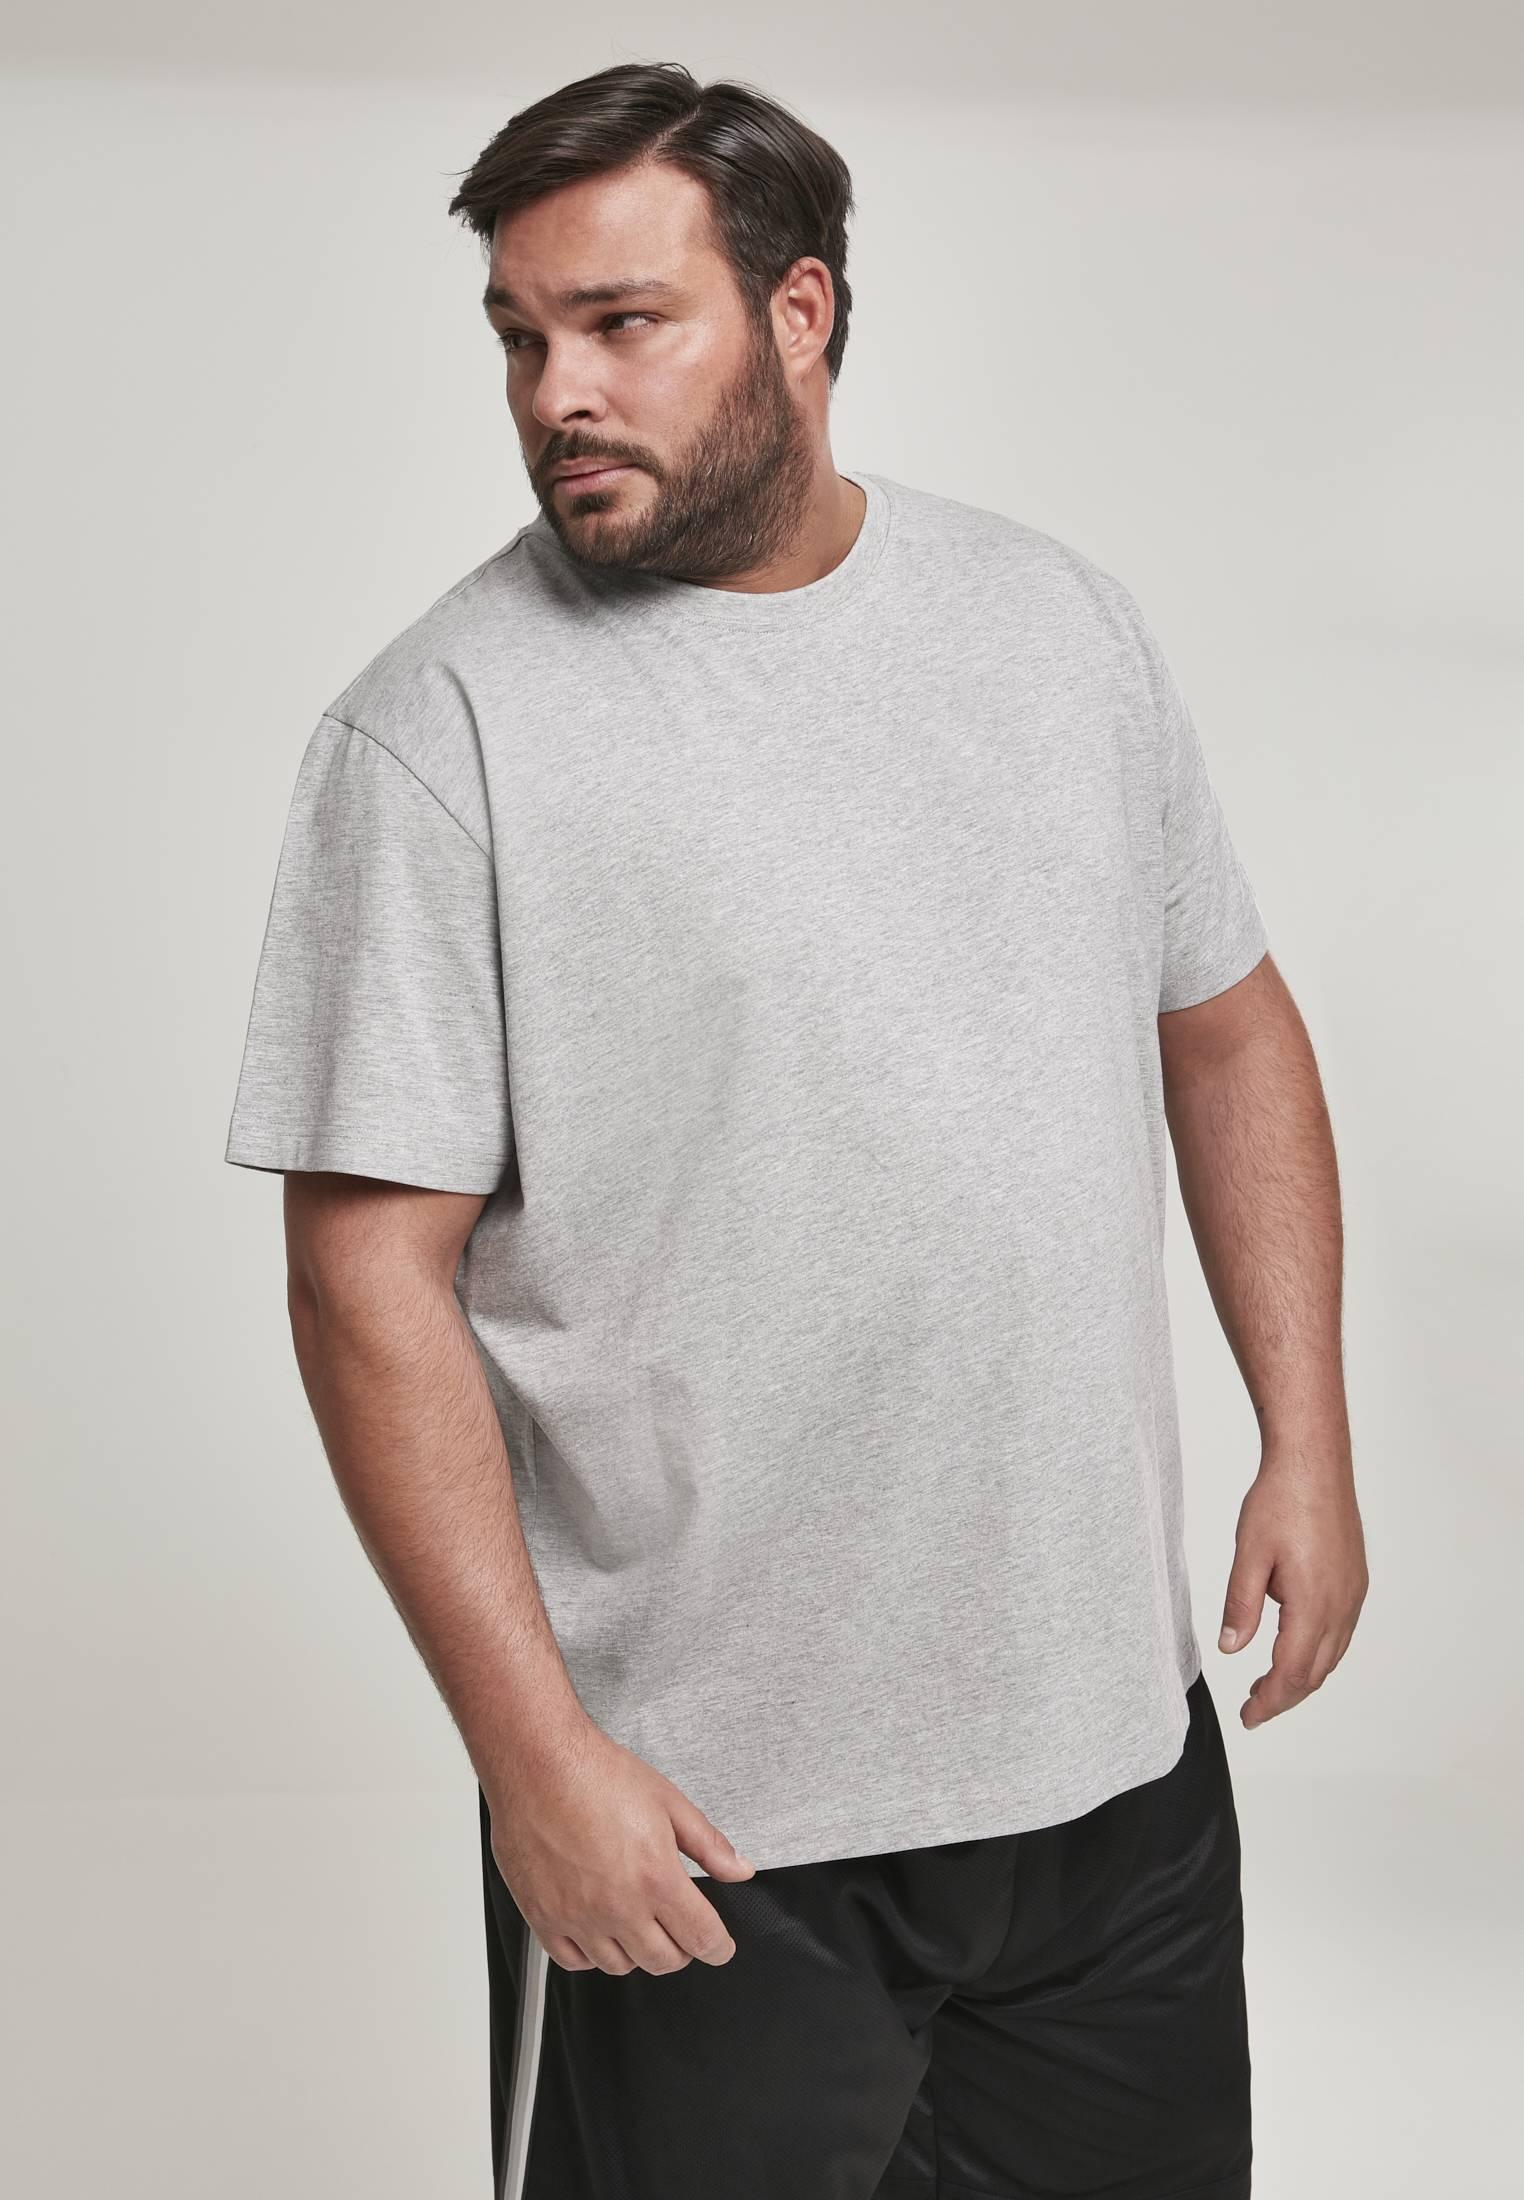 Urban Classics Basic Tee grey - S